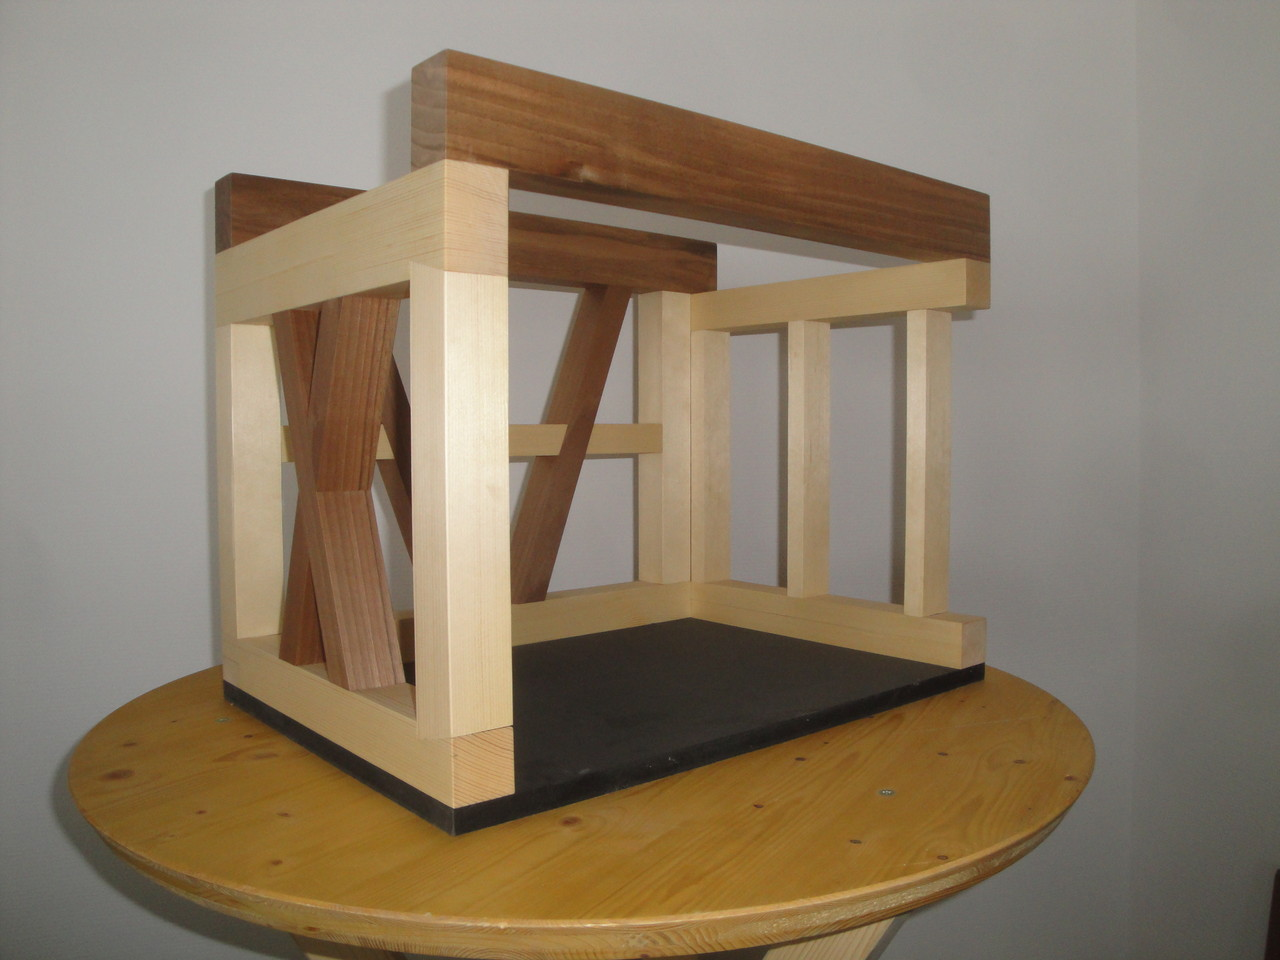 Model Remo Trümpy; 2. Lehrjahr